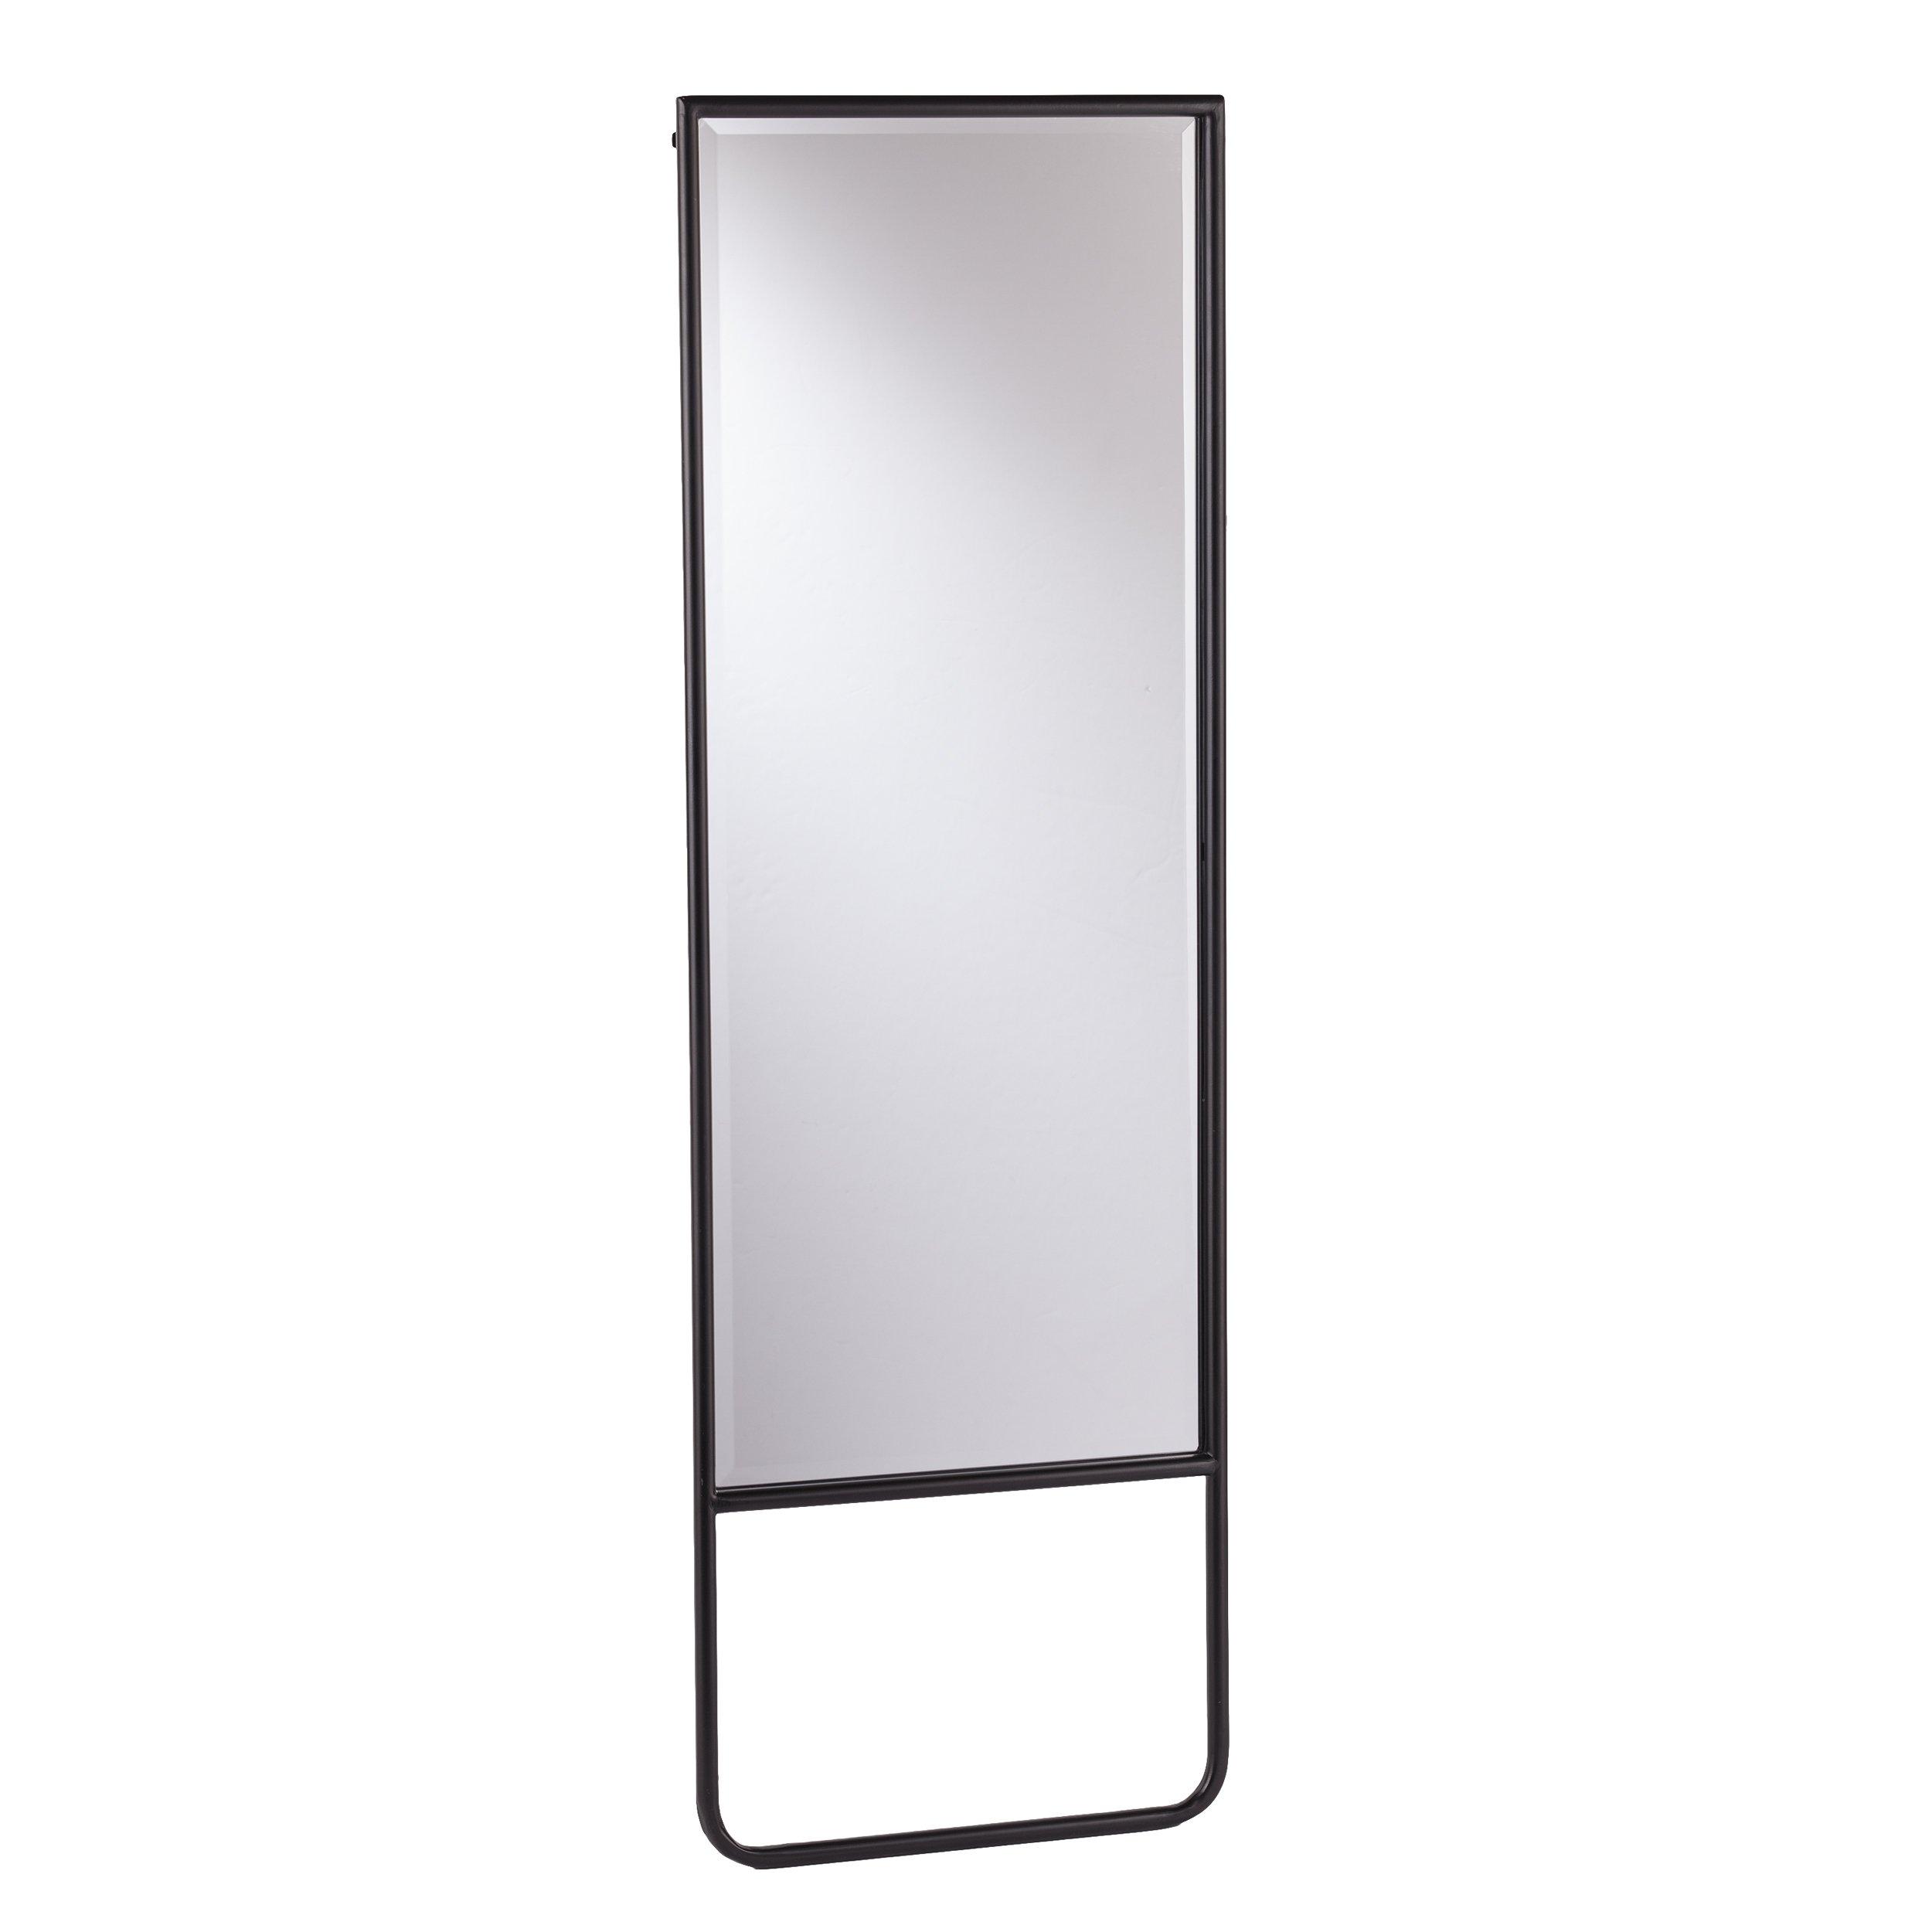 Holly & Martin – Lewis Leaning Black Floor Mirror - 20'' W x 1'' D x 62'' H